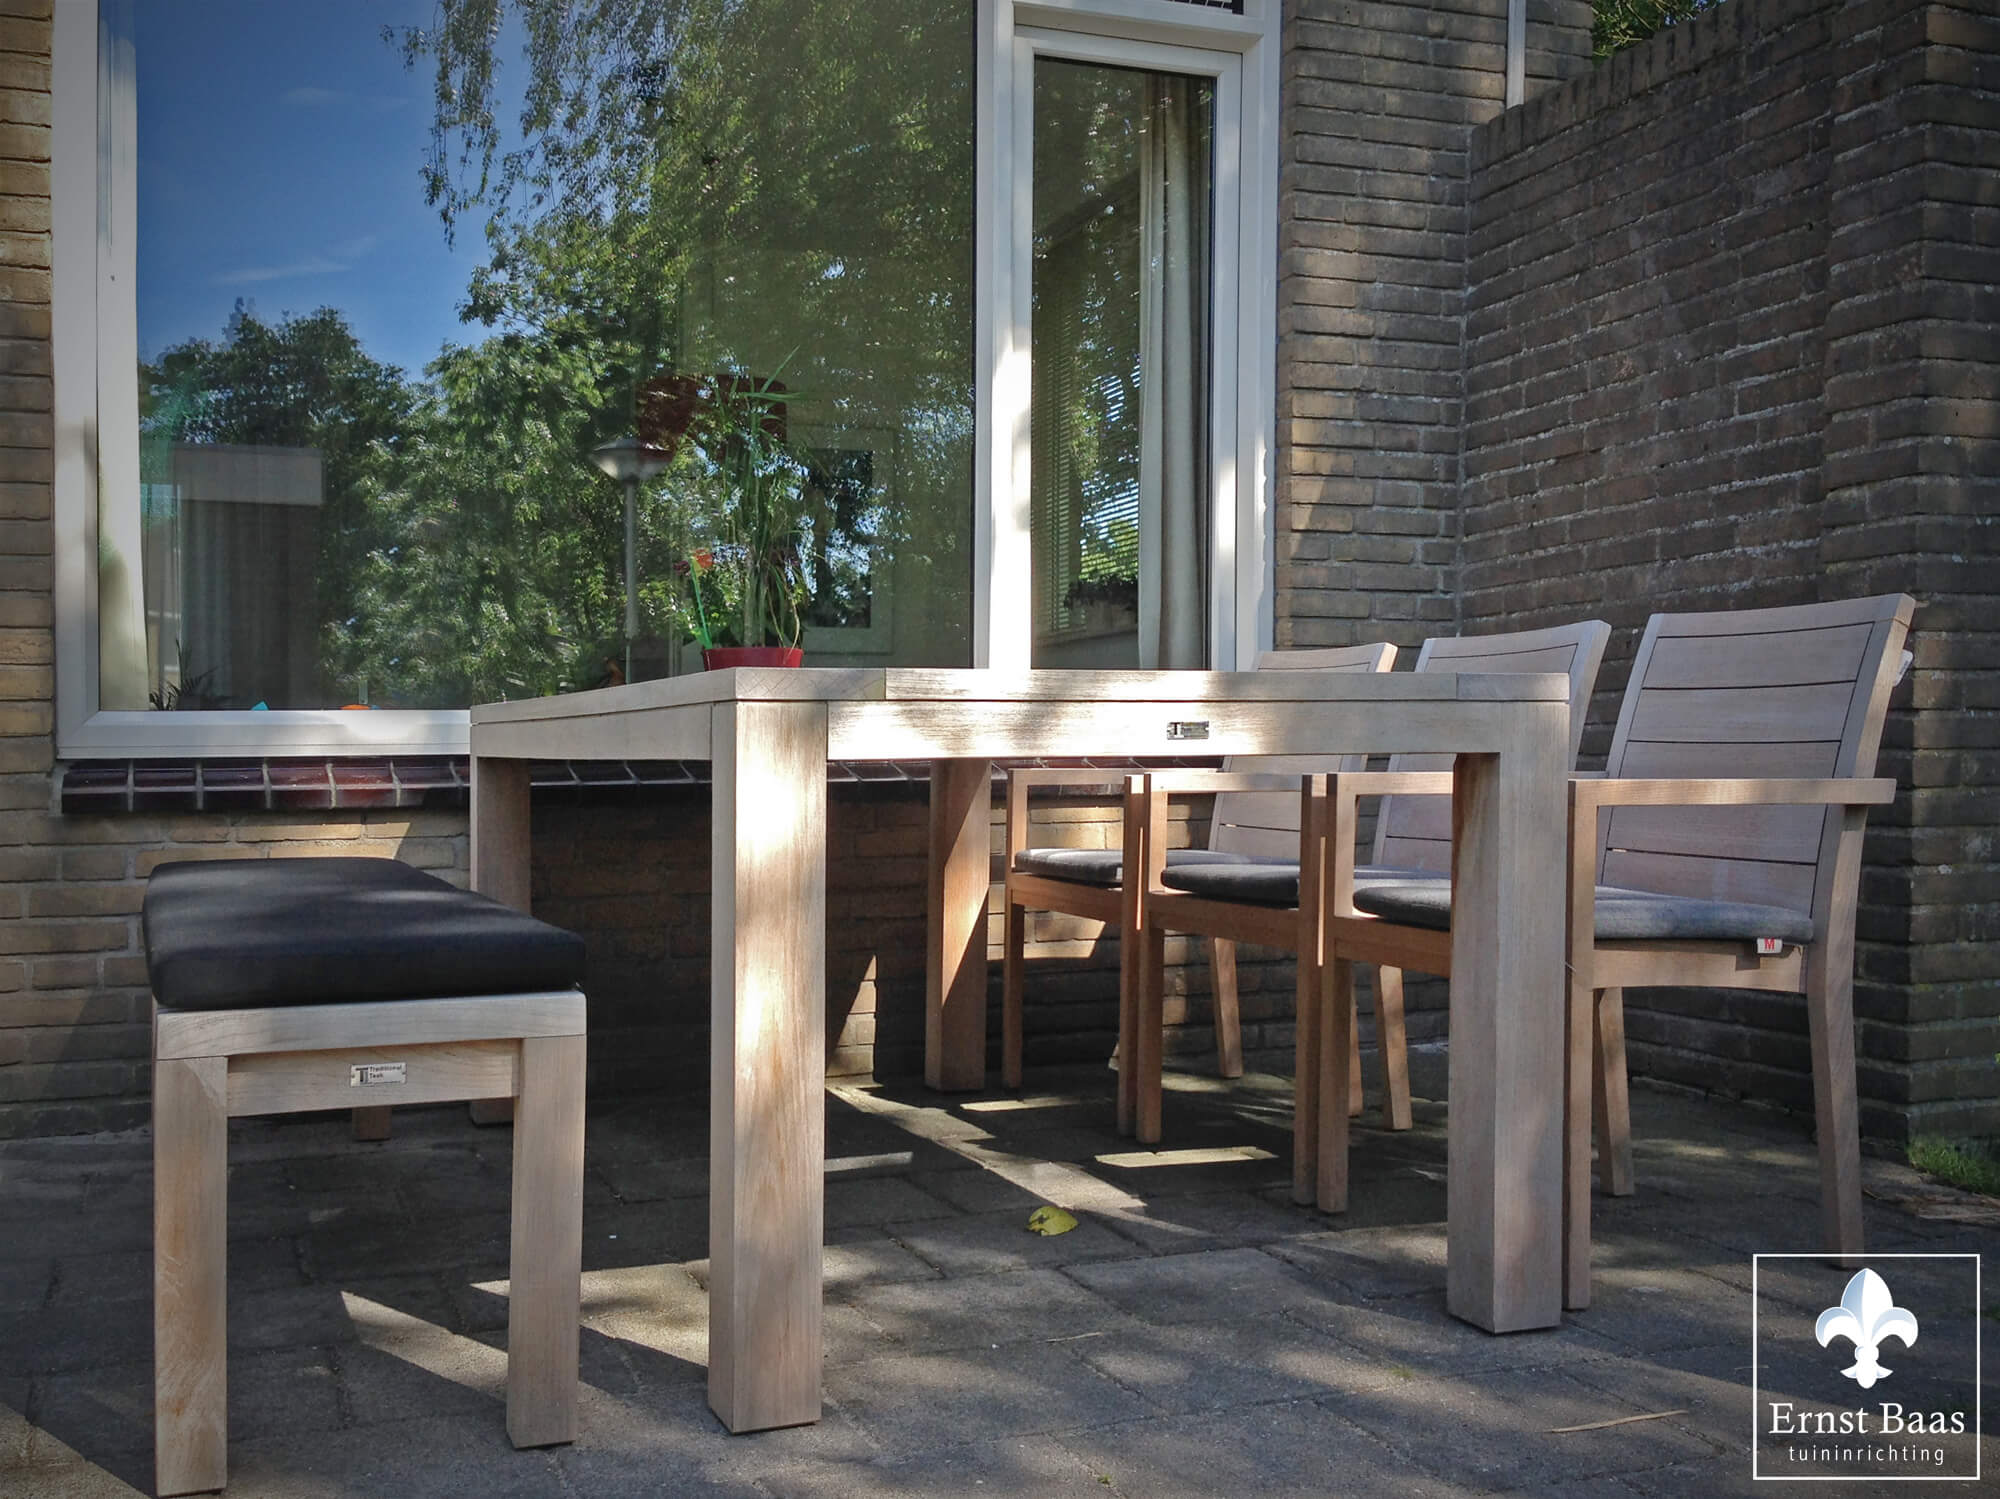 Tuinset Voor Weinig.Luxe Teakhouten Tuinset In Leiden Ernst Baas Tuininrichting